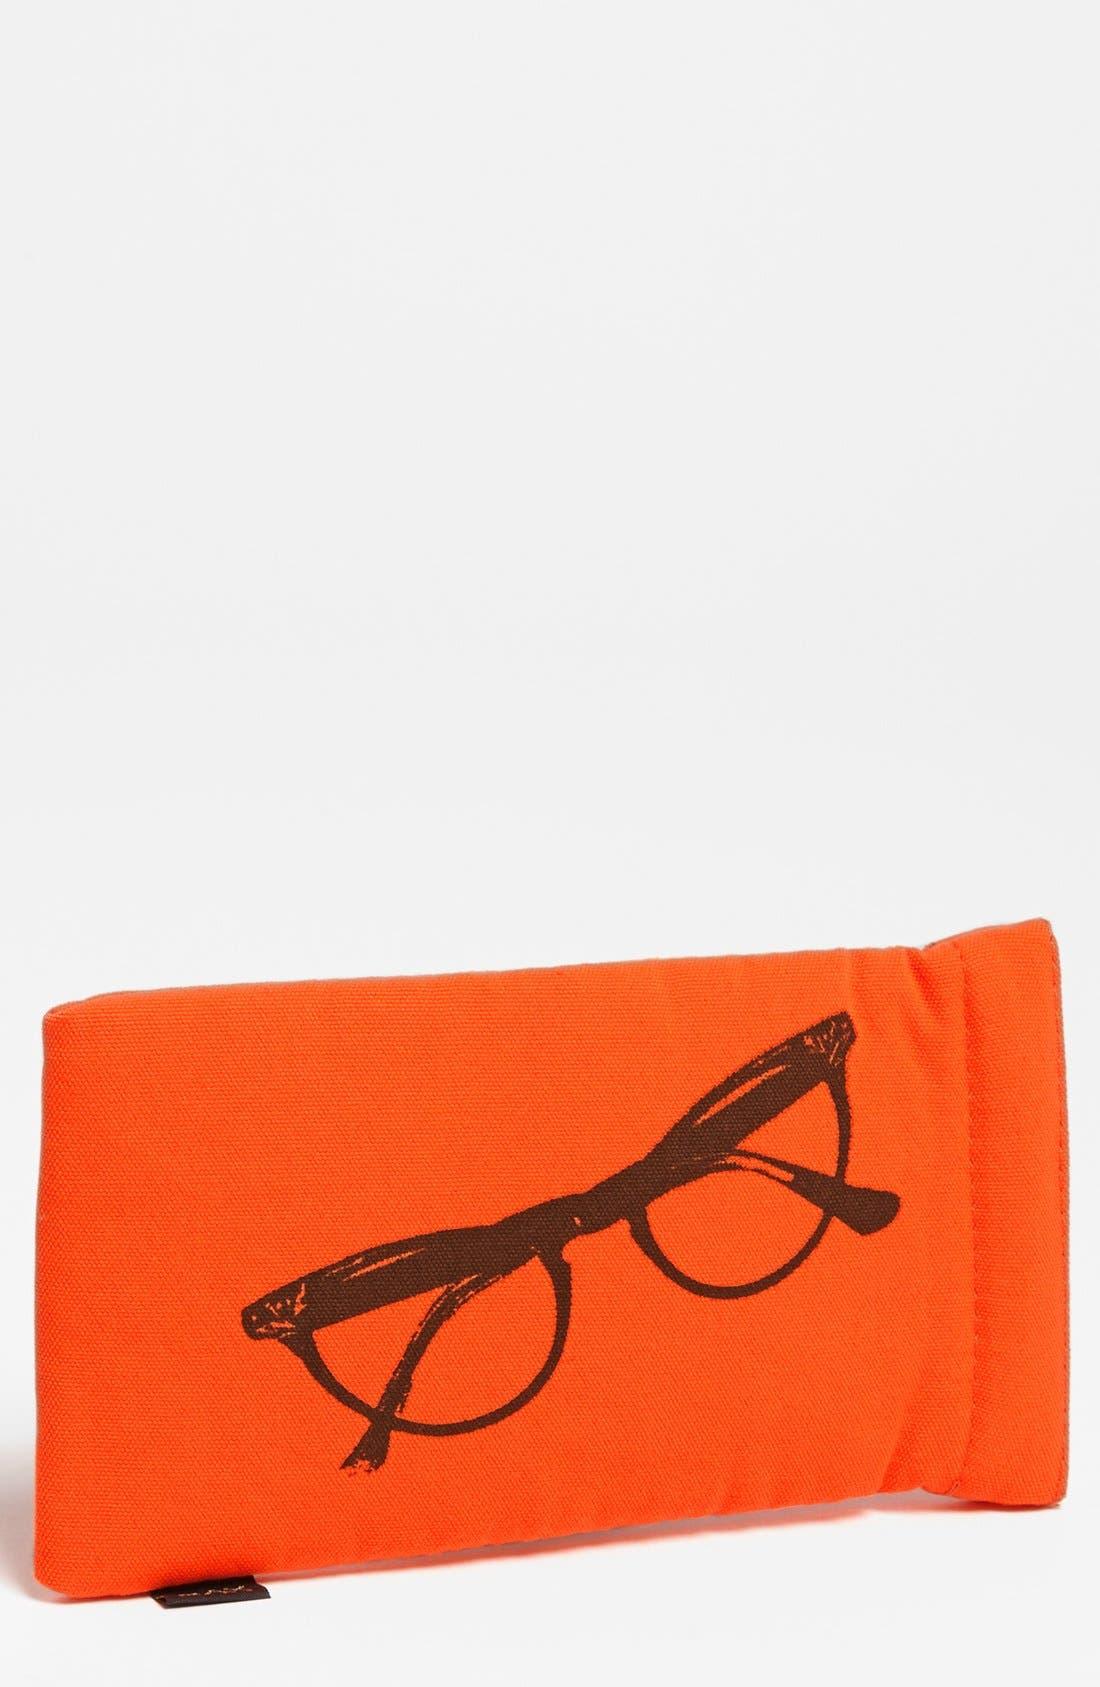 Alternate Image 1 Selected - Sax Eyewear Accessory Soft Sunglasses Case